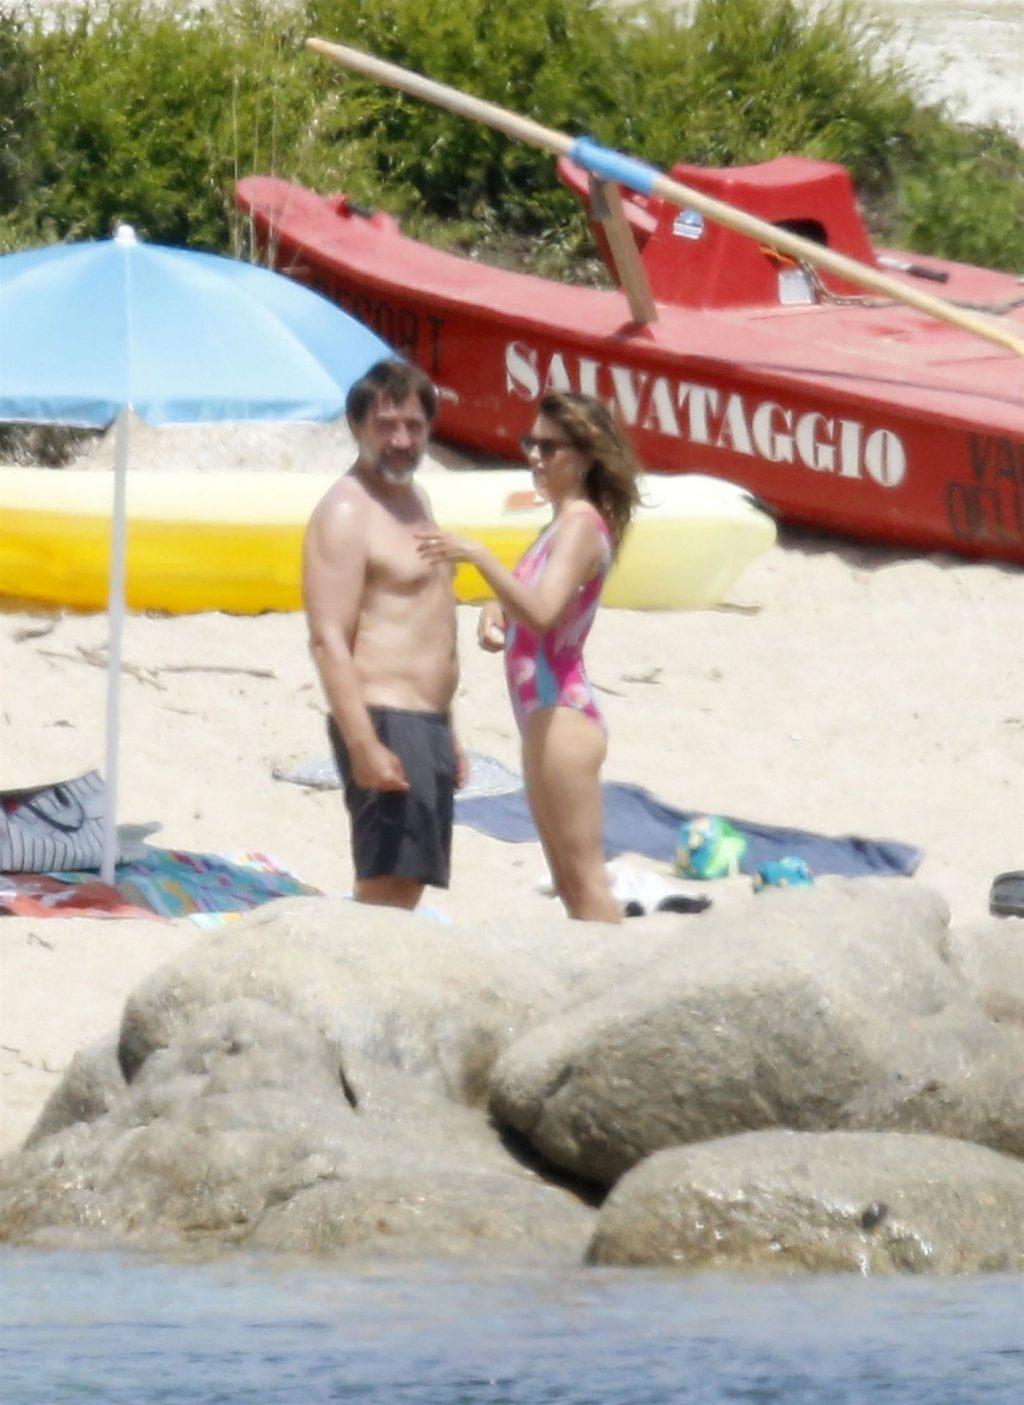 Javier Bardem & Penelope Cruz Hit The Beach on Their Sun-Kissed Holiday in Sardinia (46 Photos)